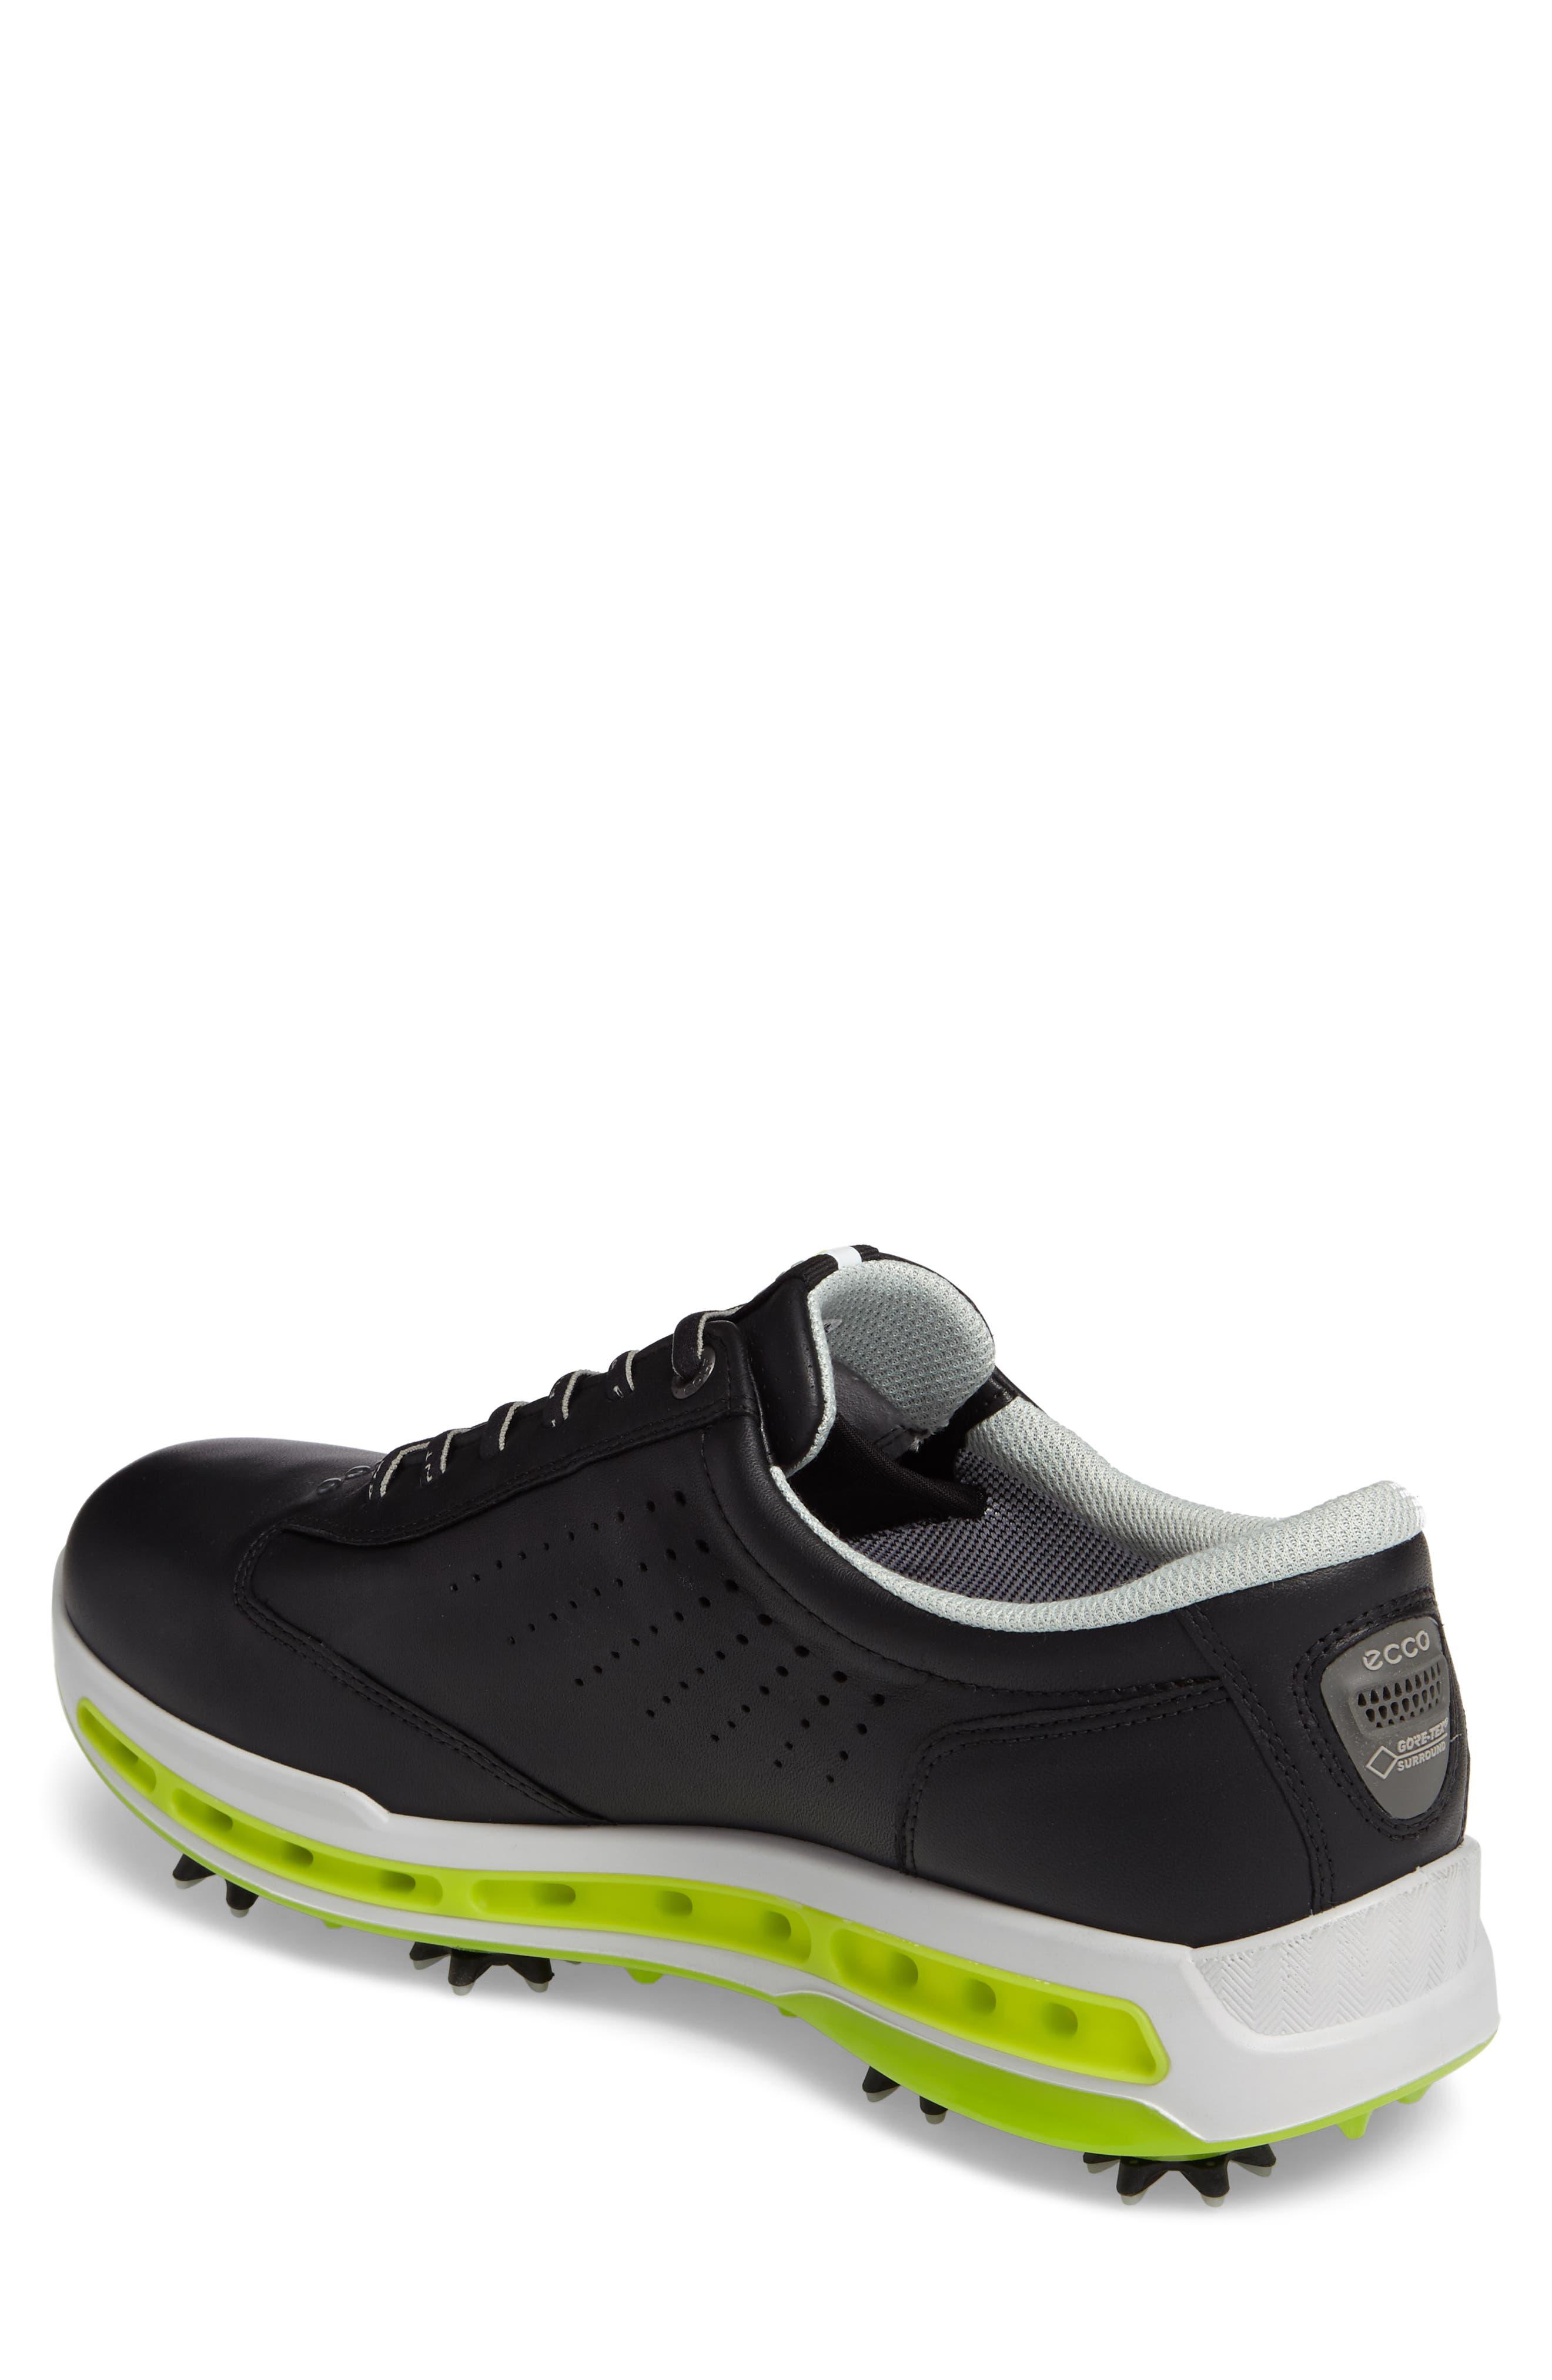 Cool GTX Golf Shoe,                             Alternate thumbnail 2, color,                             001